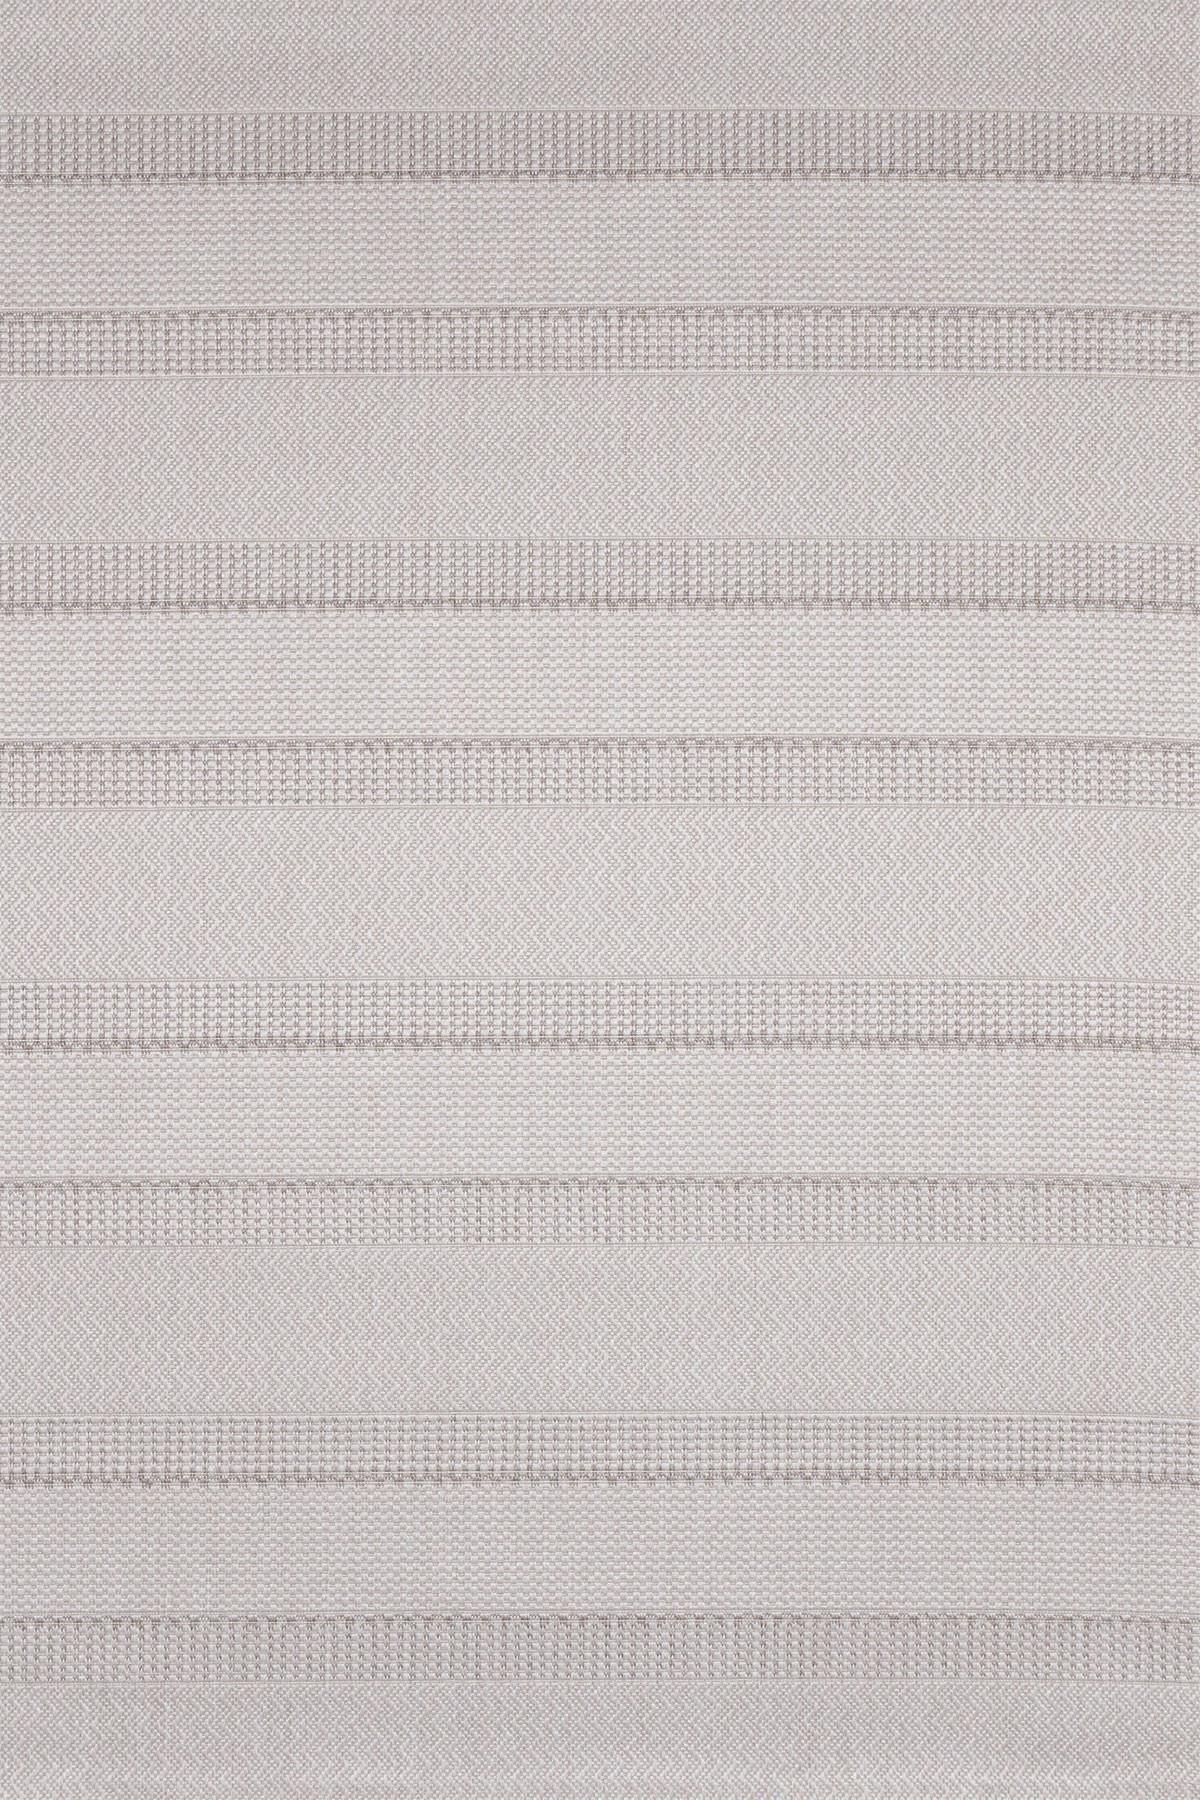 Sintelon koberce Kusový Koberec Adria 30/EBE - 160x230 cm